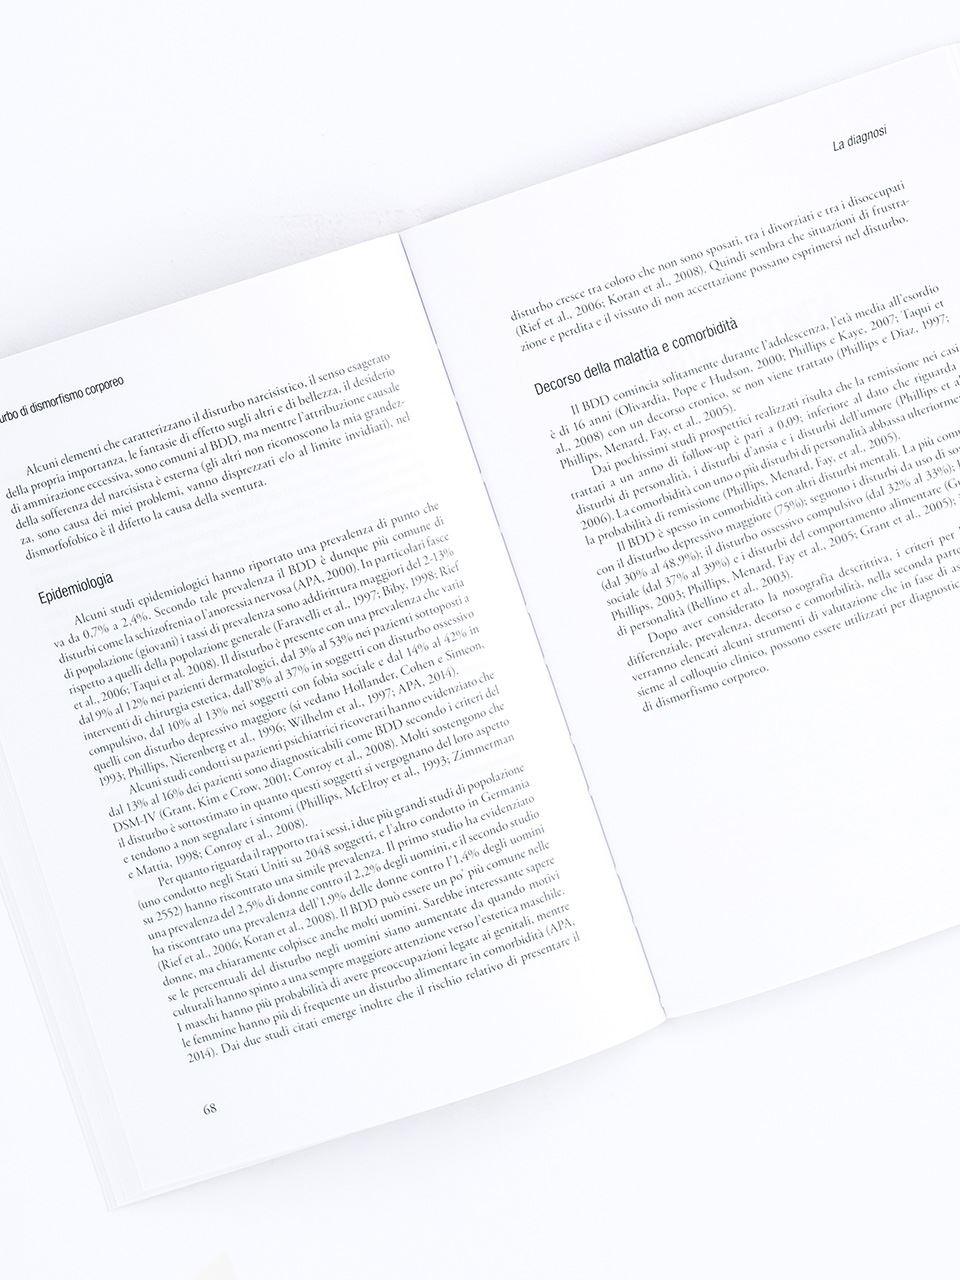 Disturbo di dismorfismo corporeo - Libri - Erickson 2